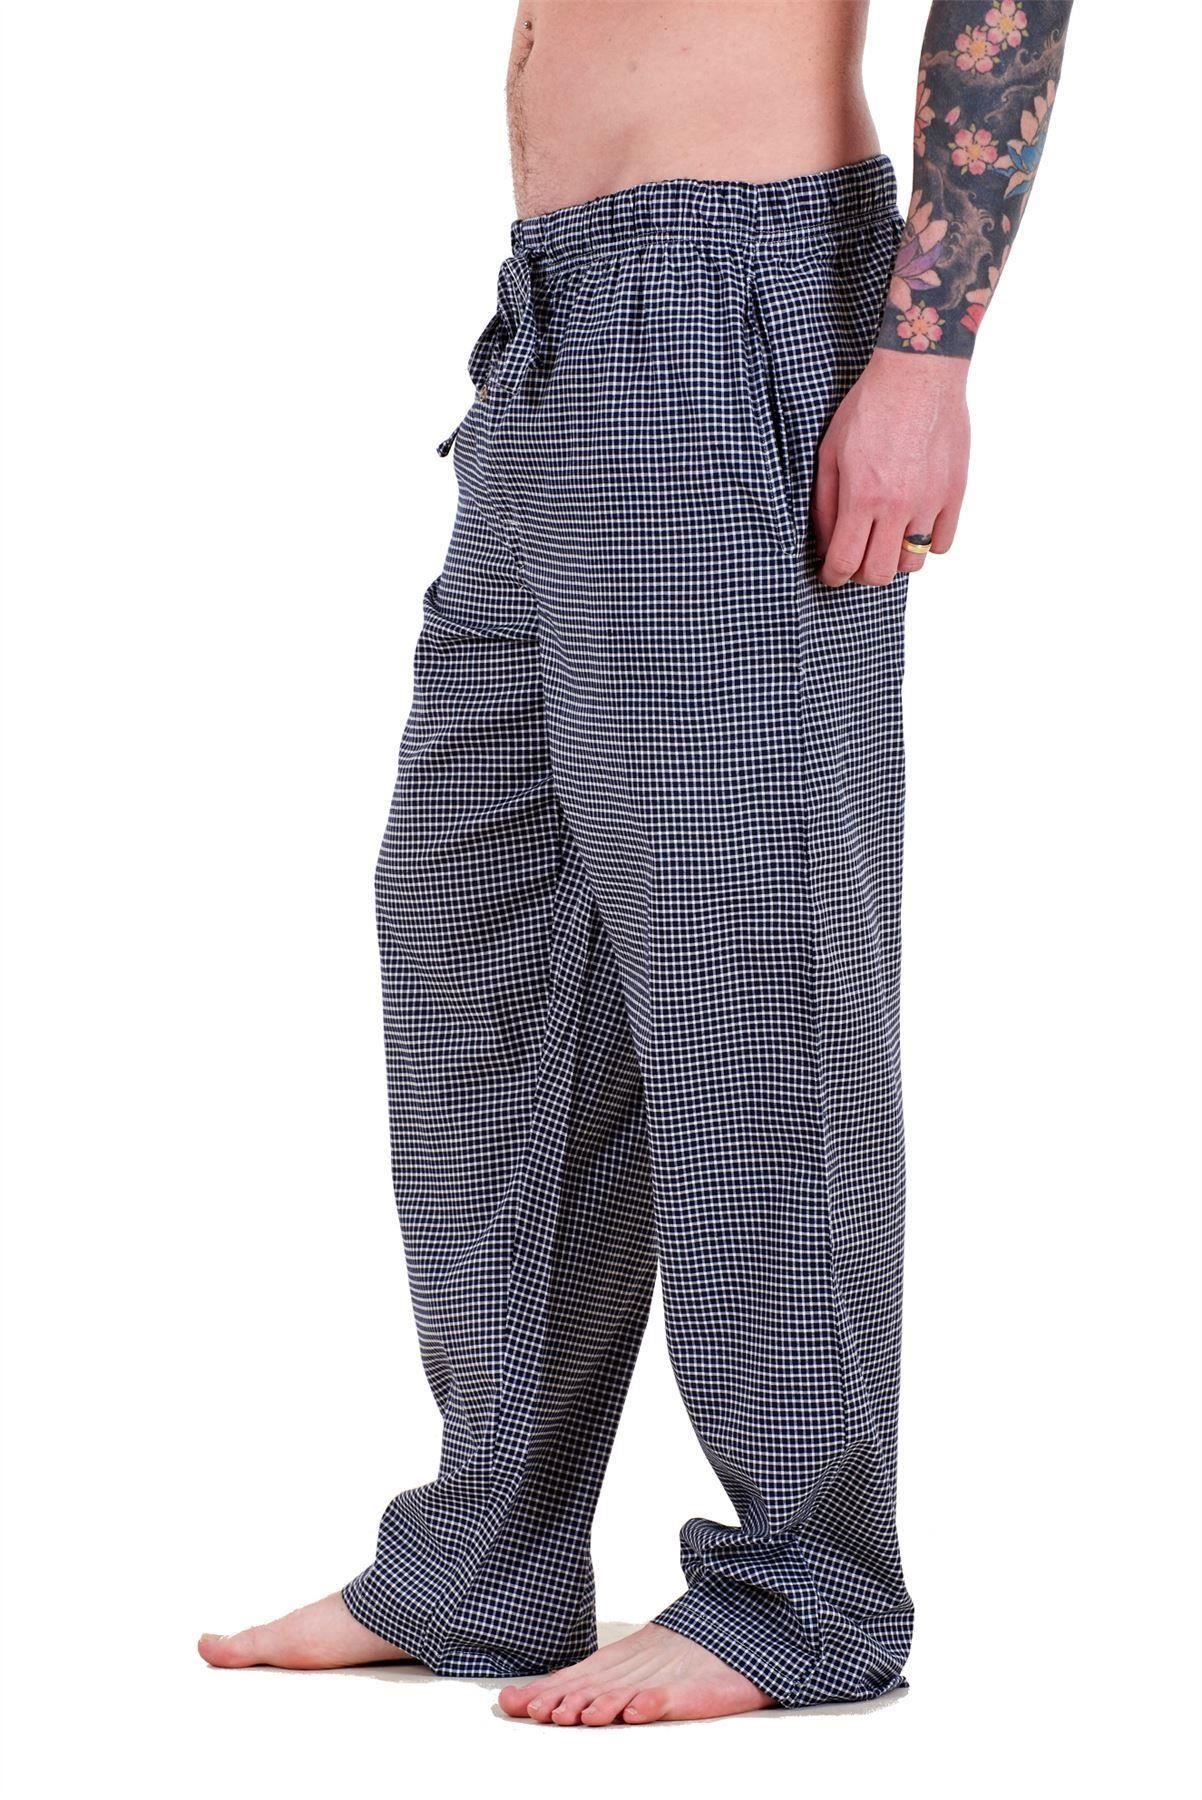 Mens-Pyjama-Bottoms-Rich-Cotton-Woven-Check-Lounge-Pant-Nightwear-Big-3XL-to-5XL Indexbild 50